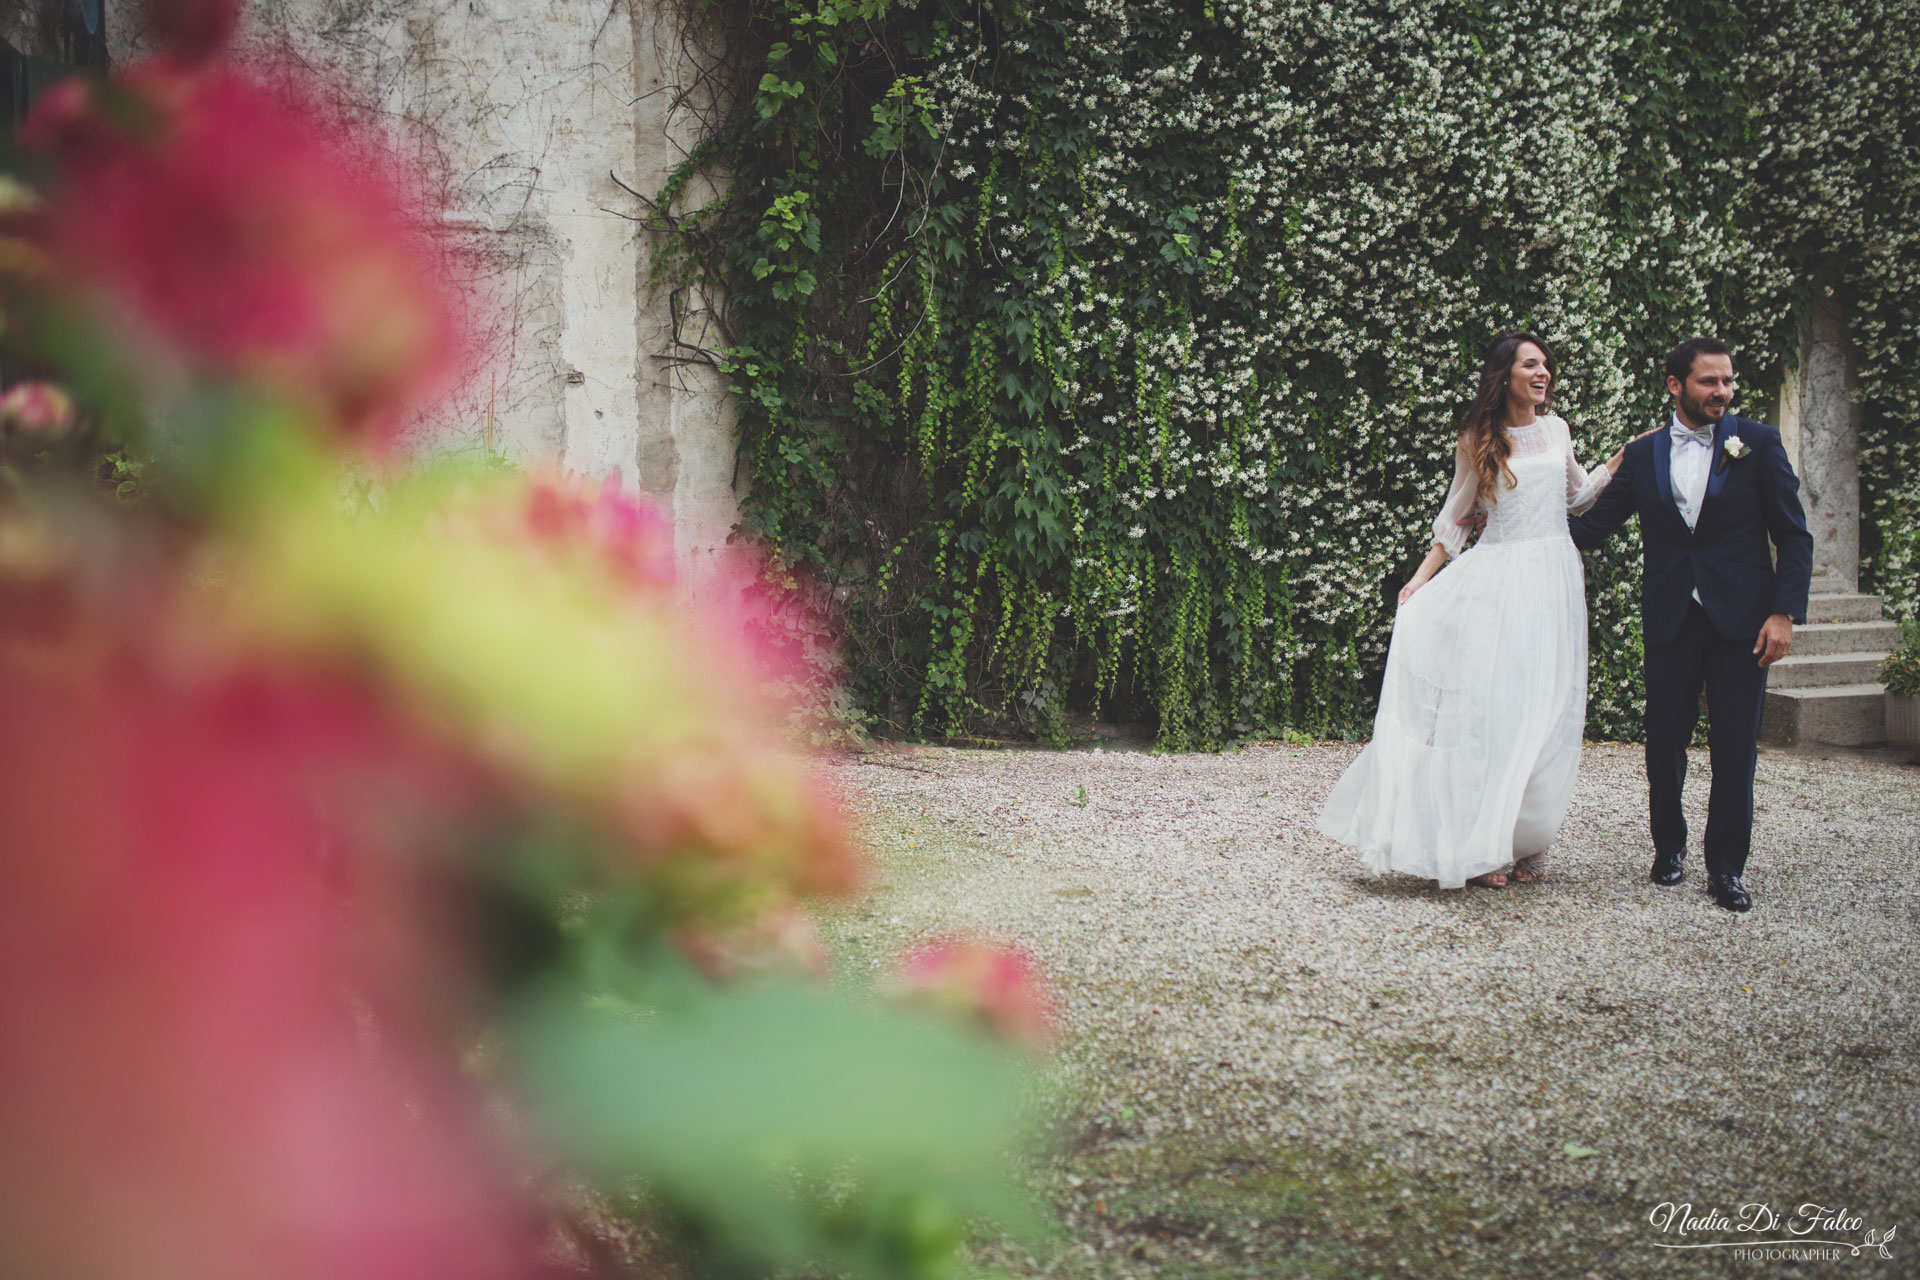 Foto Matrimonio Bohemien : Matrimonio boho chic grafica matrimoni